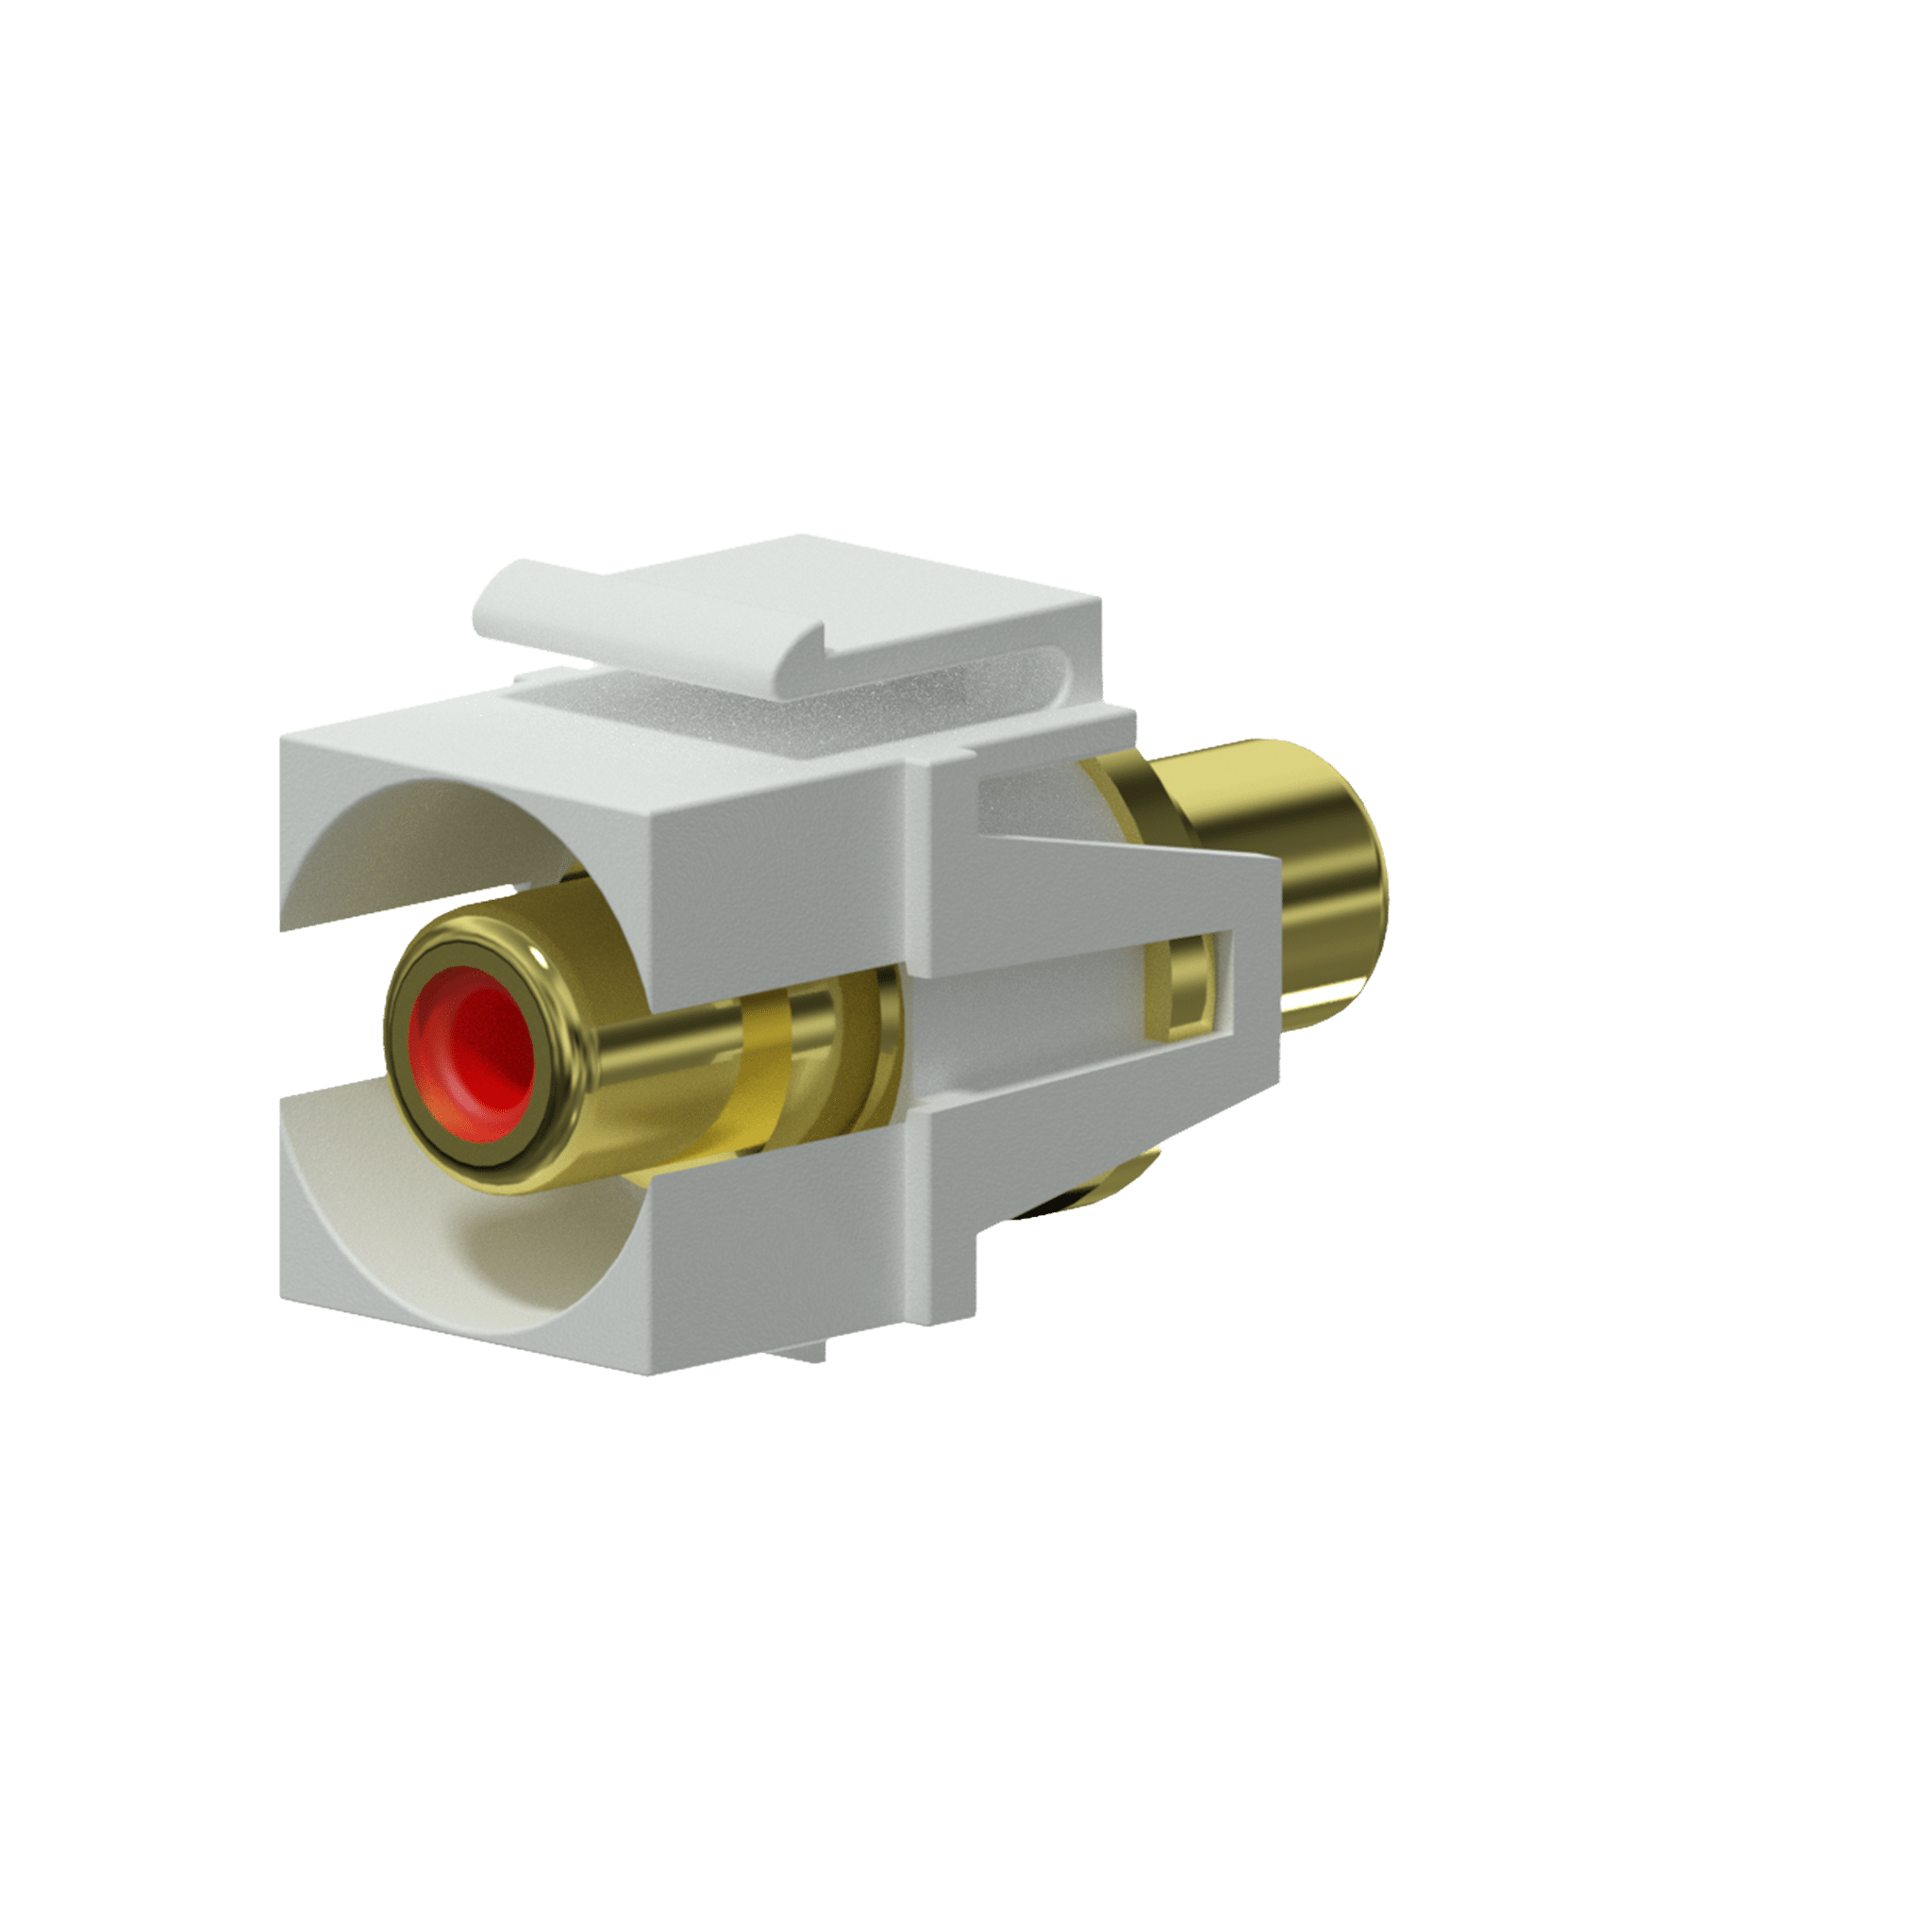 VCK107P/W - White